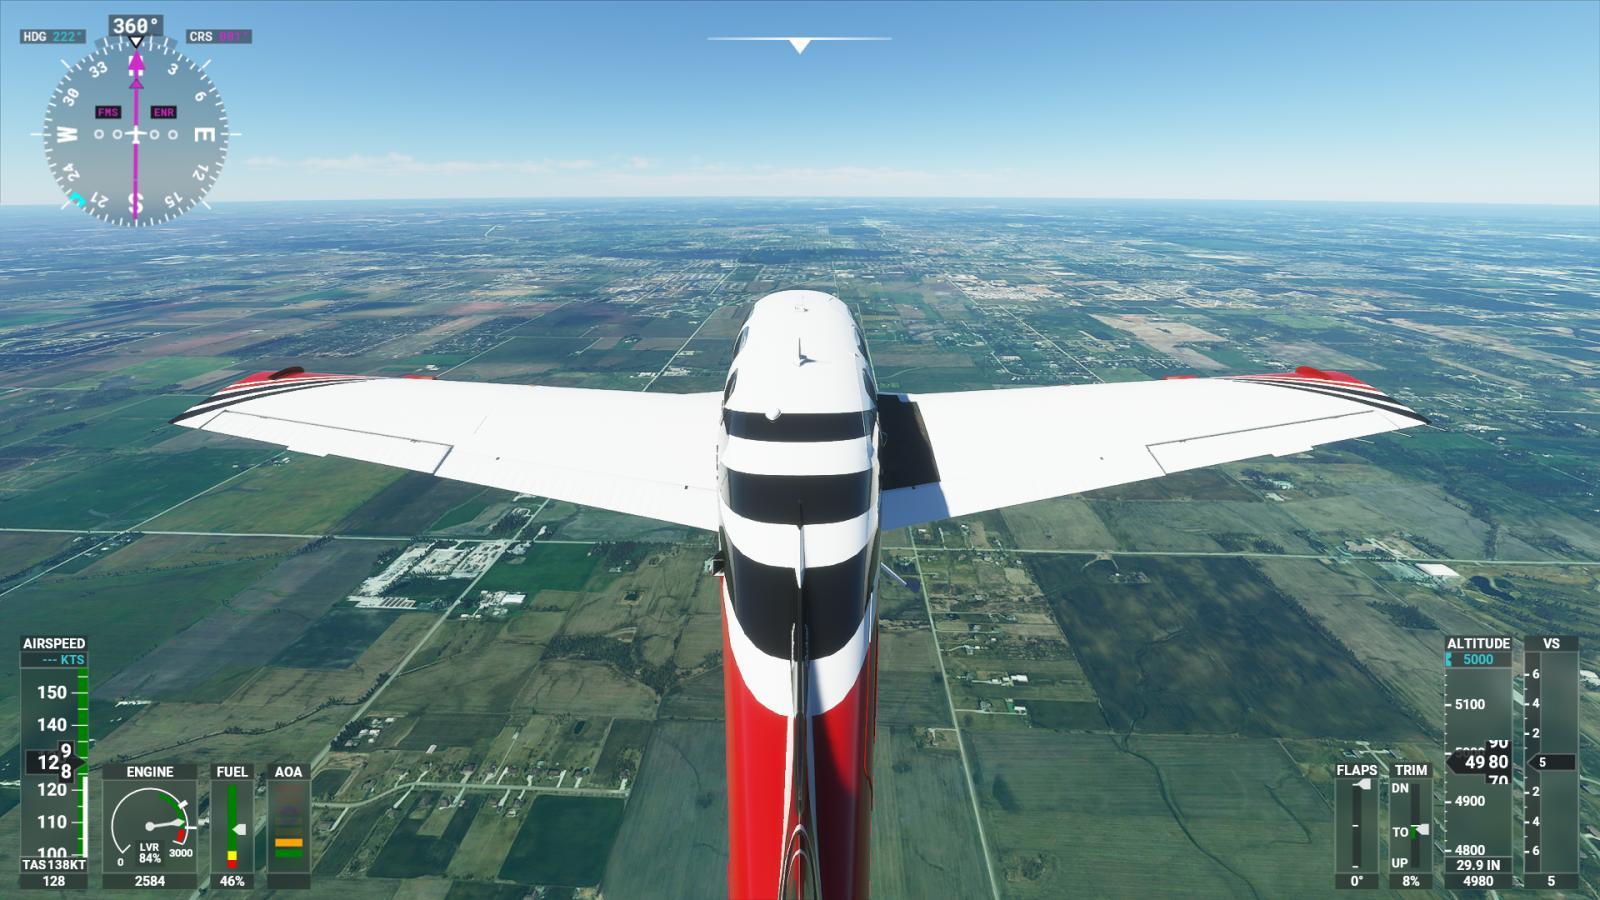 İsim:  Microsoft Flight Simulator Screenshot 2020.08.21 - 23.05.01.11.jpg Görüntüleme: 122 Büyüklük:  185.5 KB (Kilobyte)